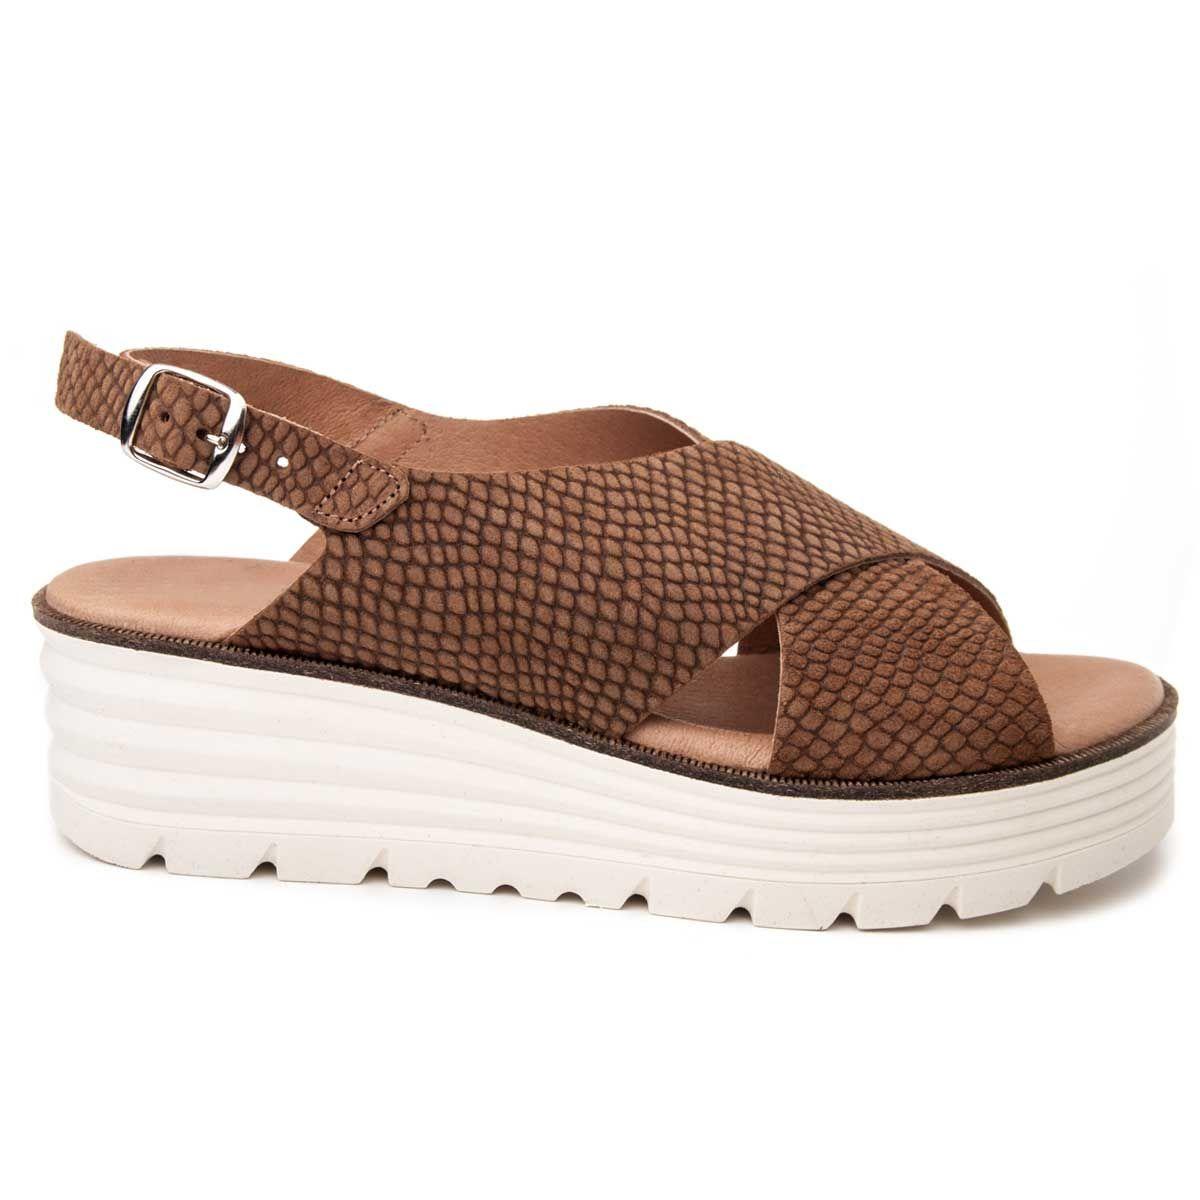 Purapiel Wedge Sandal in Taupe